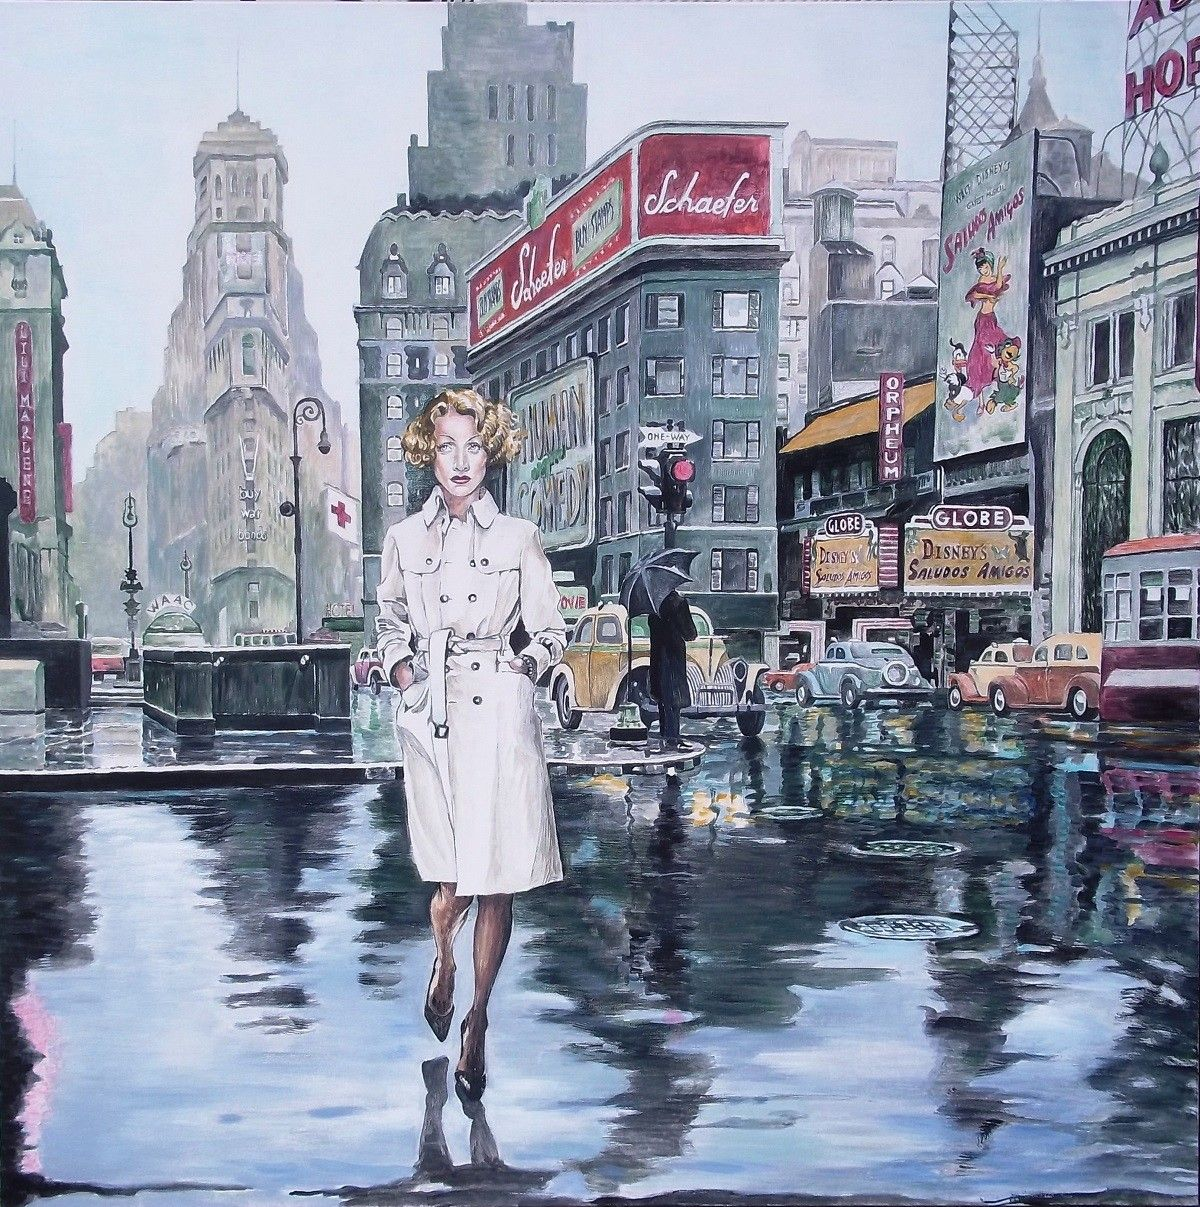 ACRILICO SU TELA  GIO'  STEFAN  ' MARLENE. NEW YORK 1943 '  dimensioni  L 100 x H 100 cm.